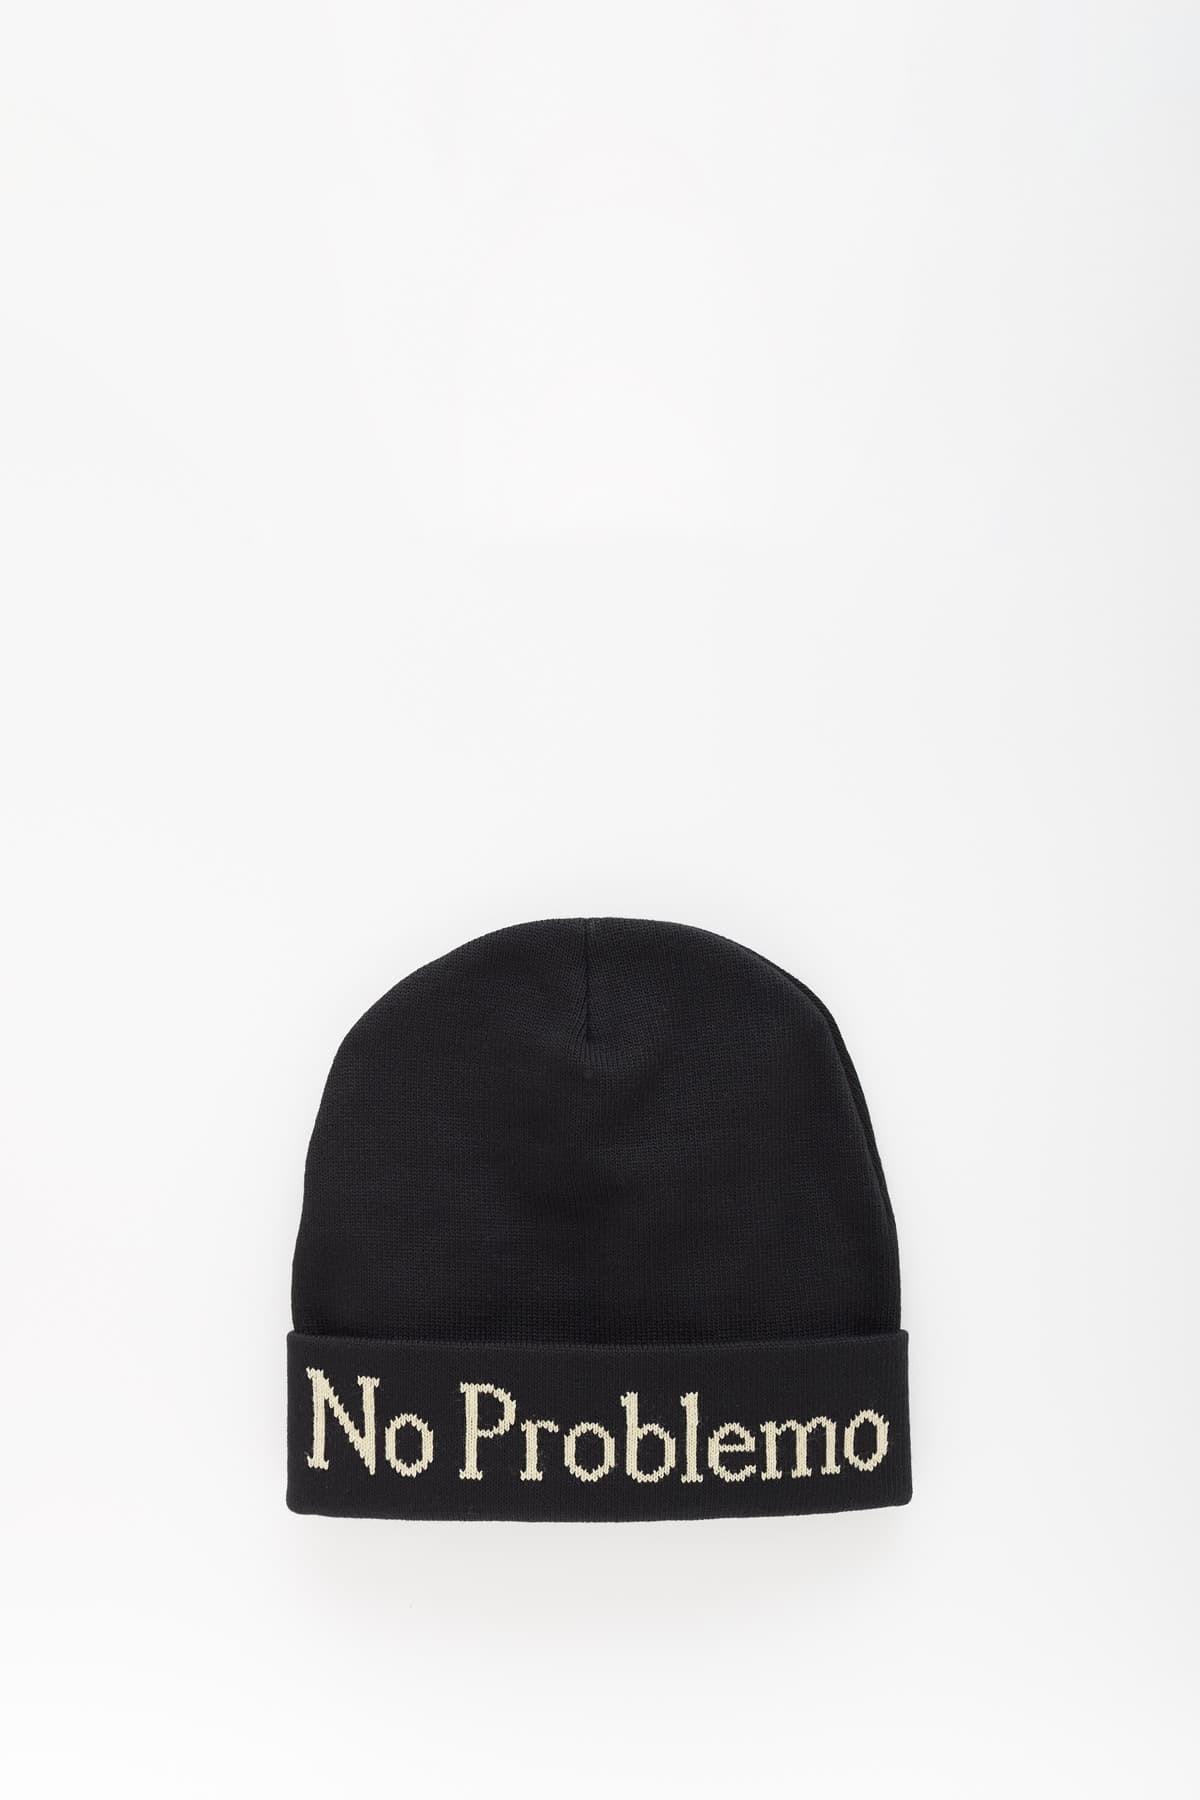 Acne Studios Black Ren Fluid Satin Short Trousers